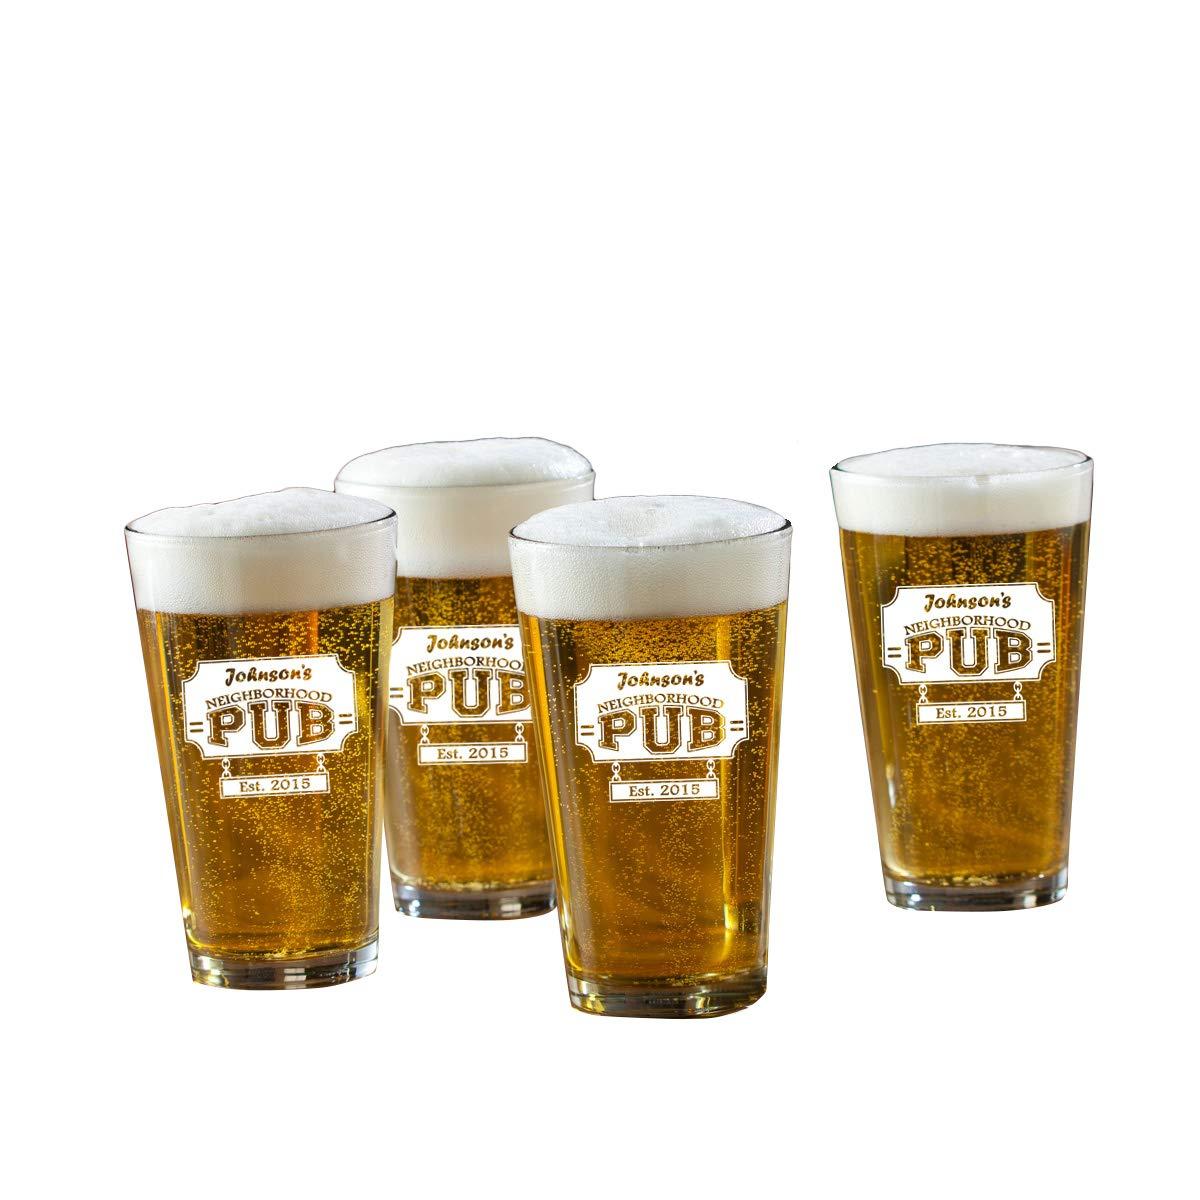 Set of 4 Personalized Neighborhood Pub Pint Glasses - Monogrammed Pint Glasses - Custom Beer Glasses